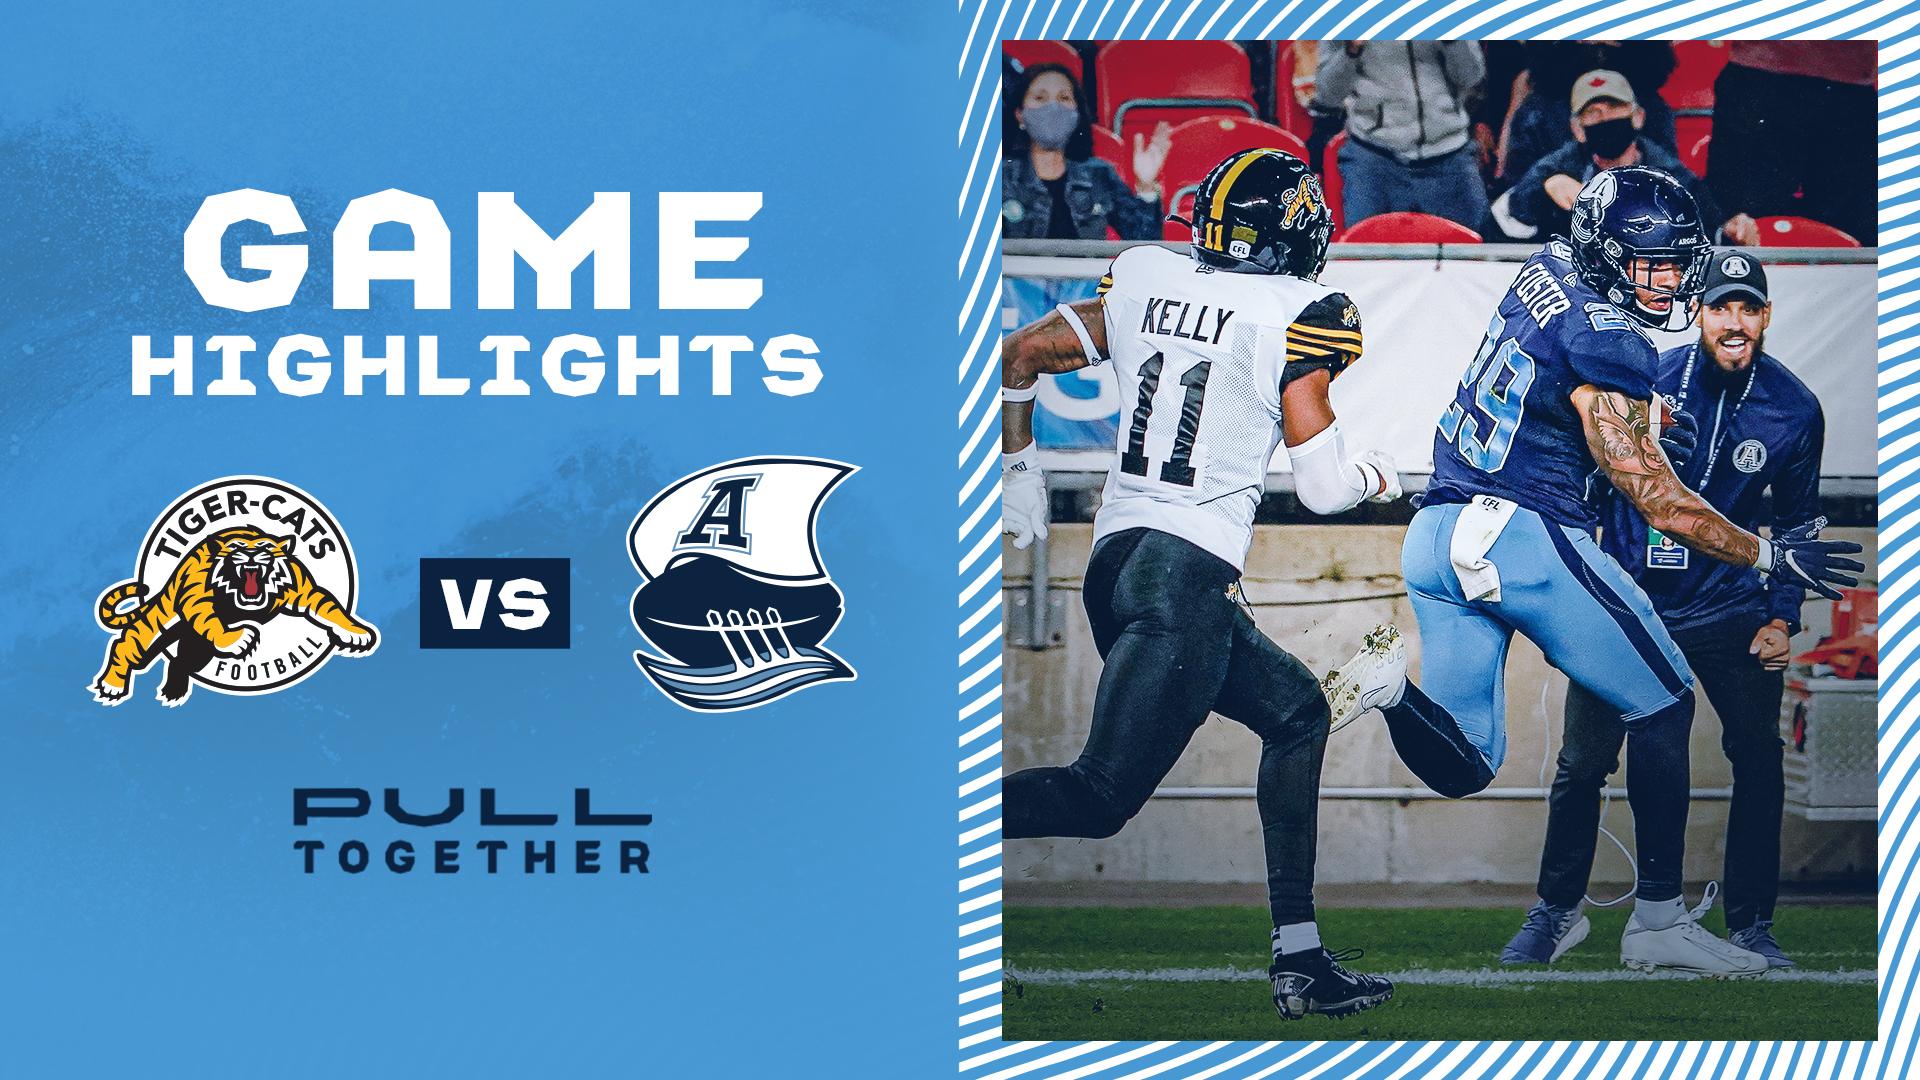 Game Highlights | Toronto Argonauts vs. Hamilton Tiger-Cats